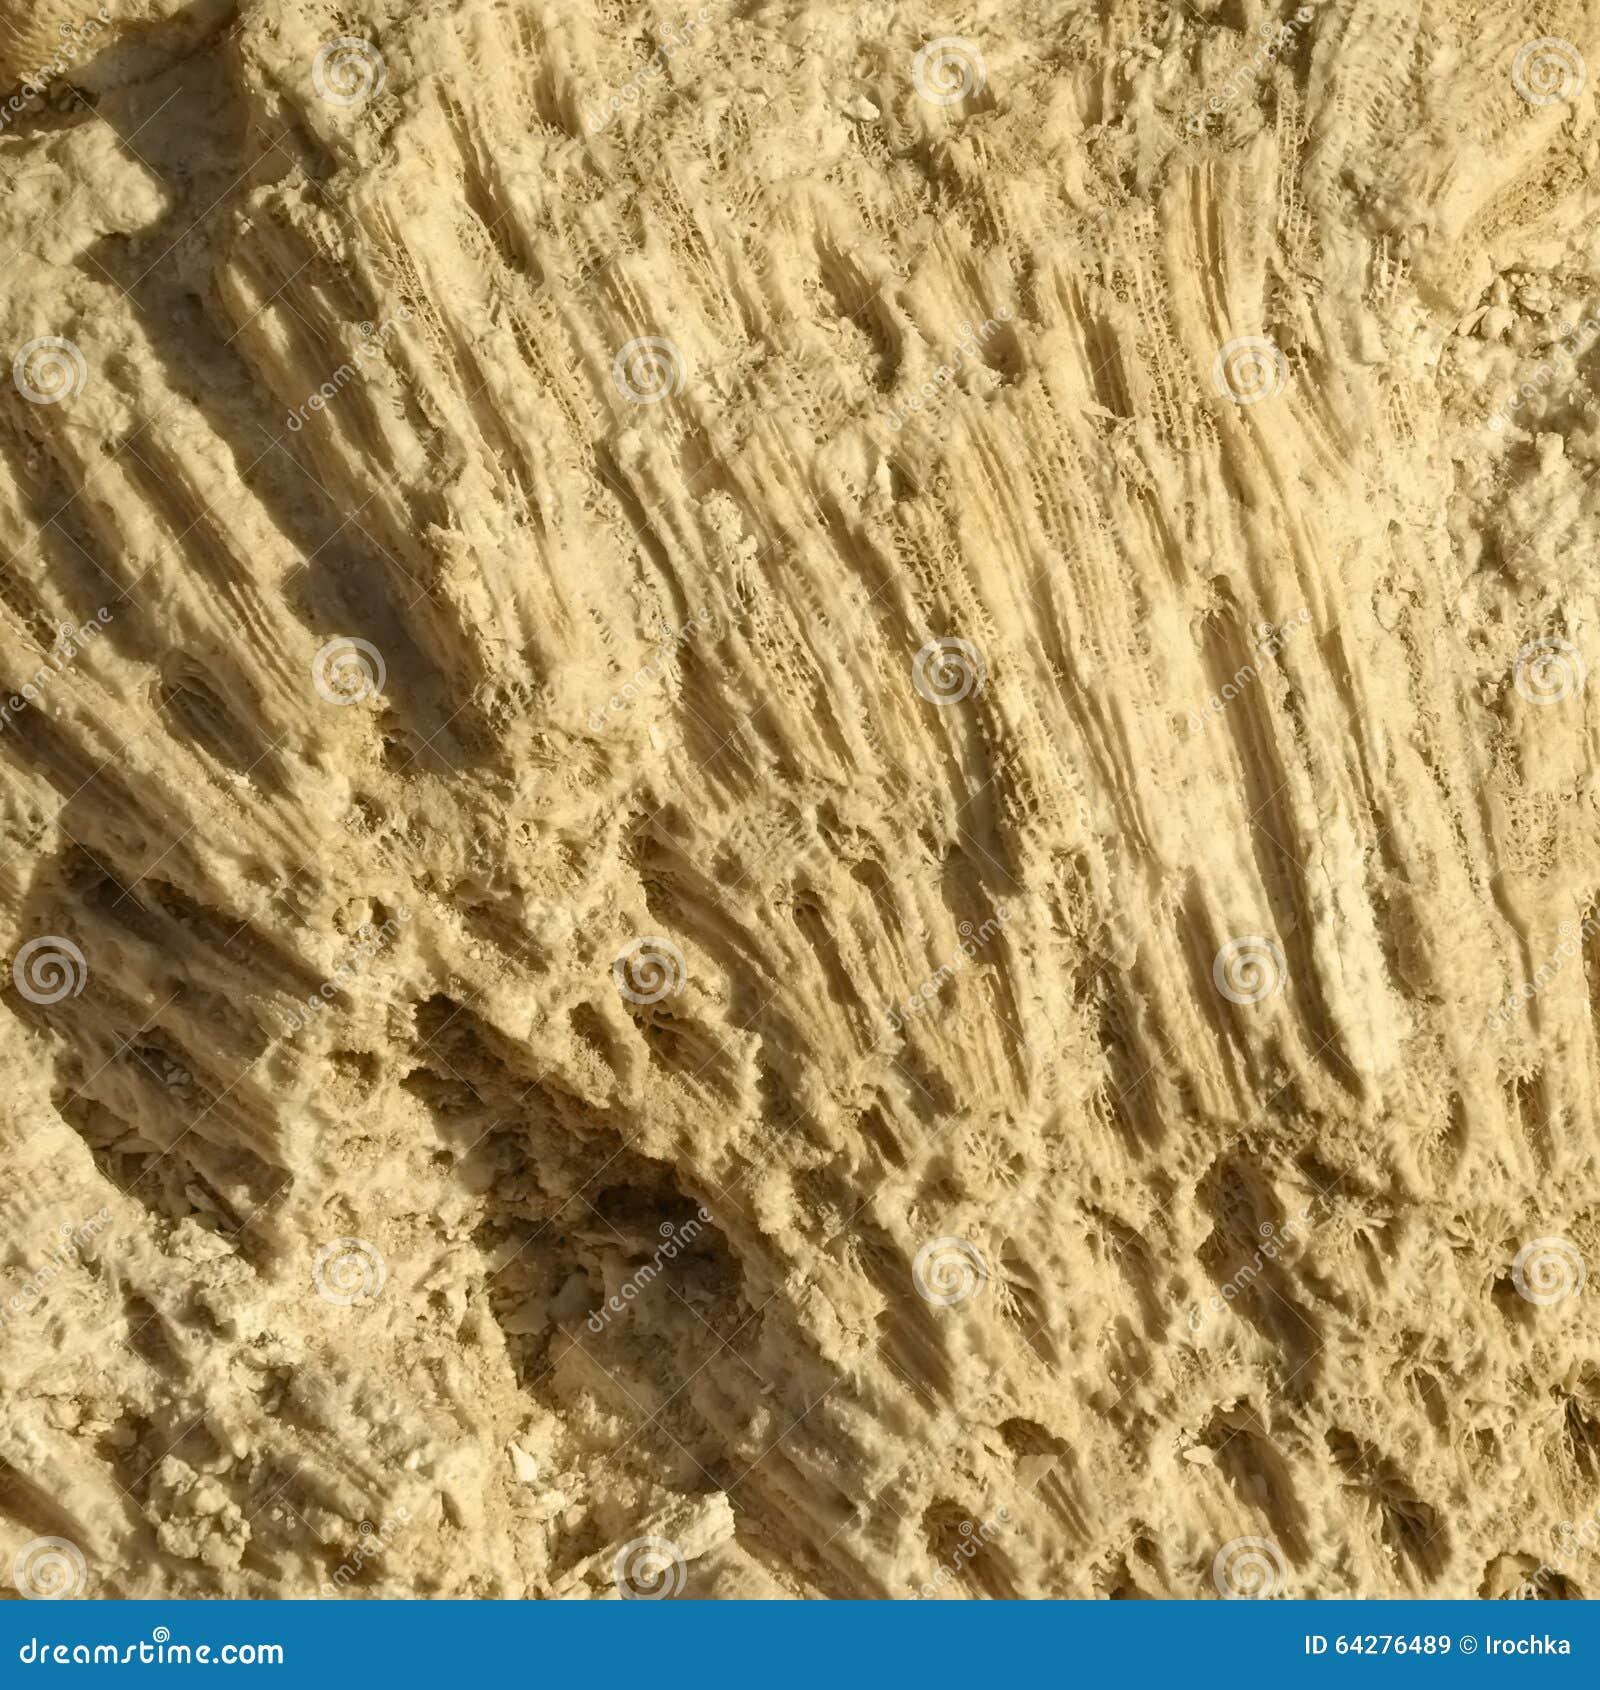 Textur bildade vid korallerna i kust- kalksten